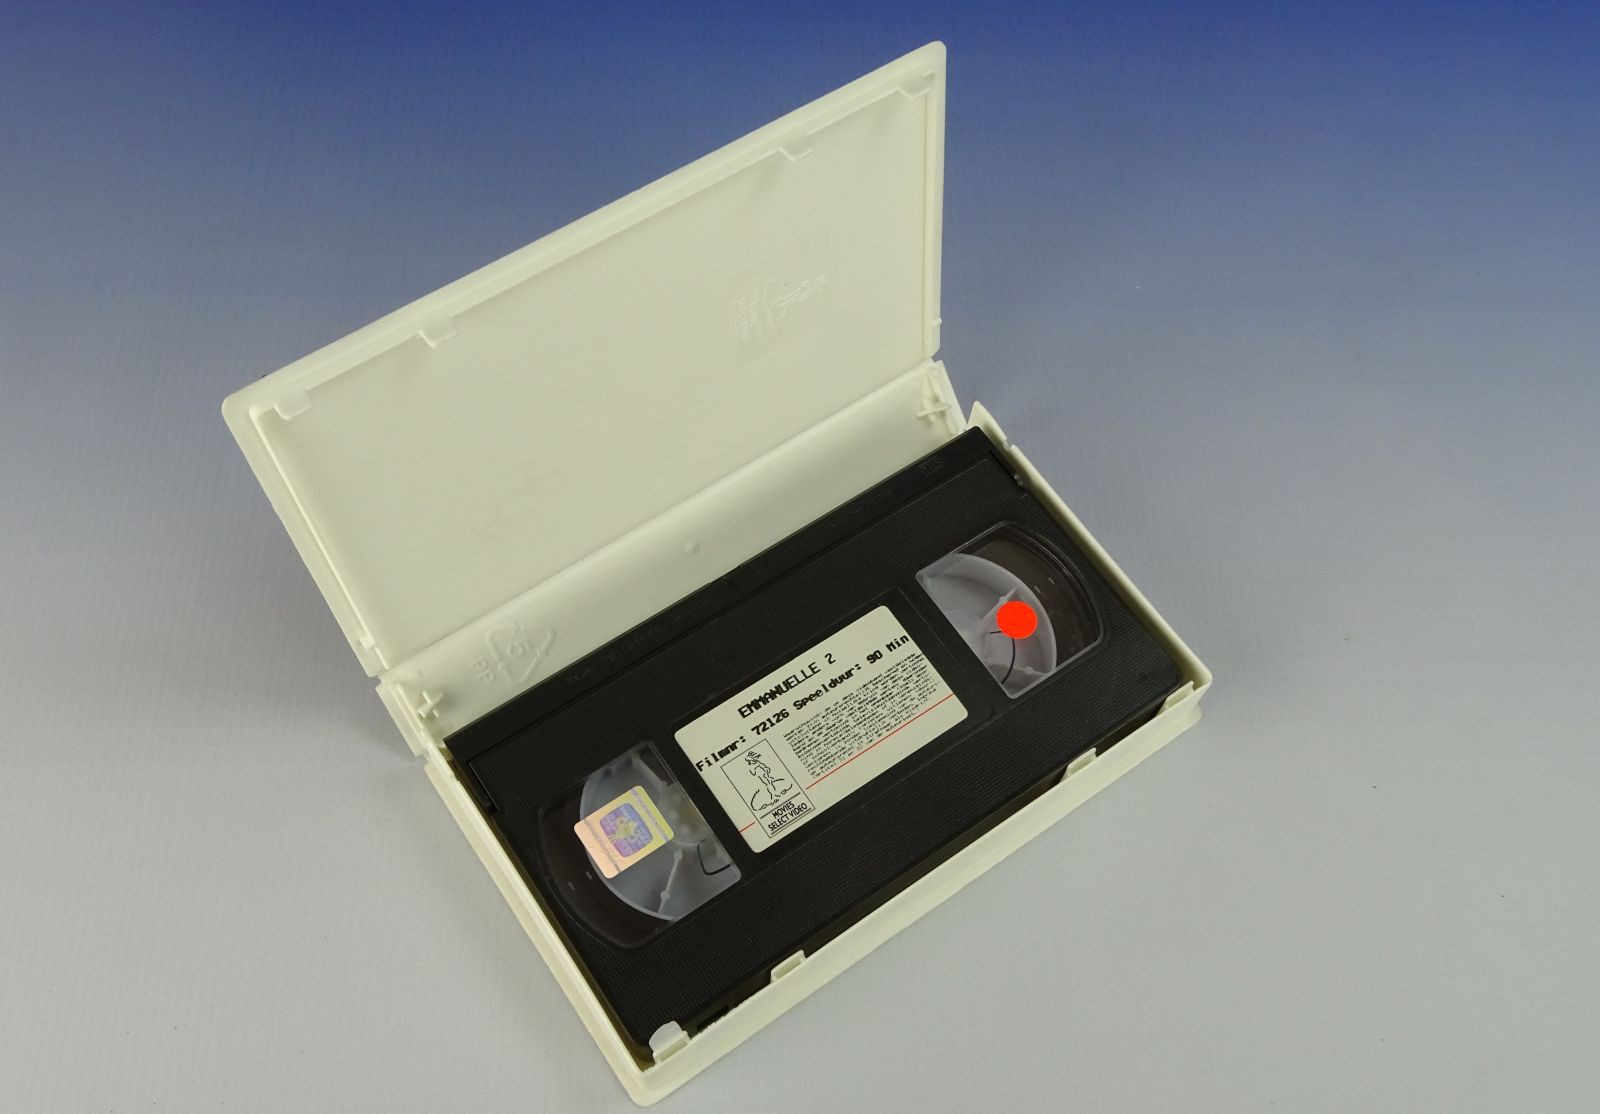 DSC07744.JPG (1600�1114)